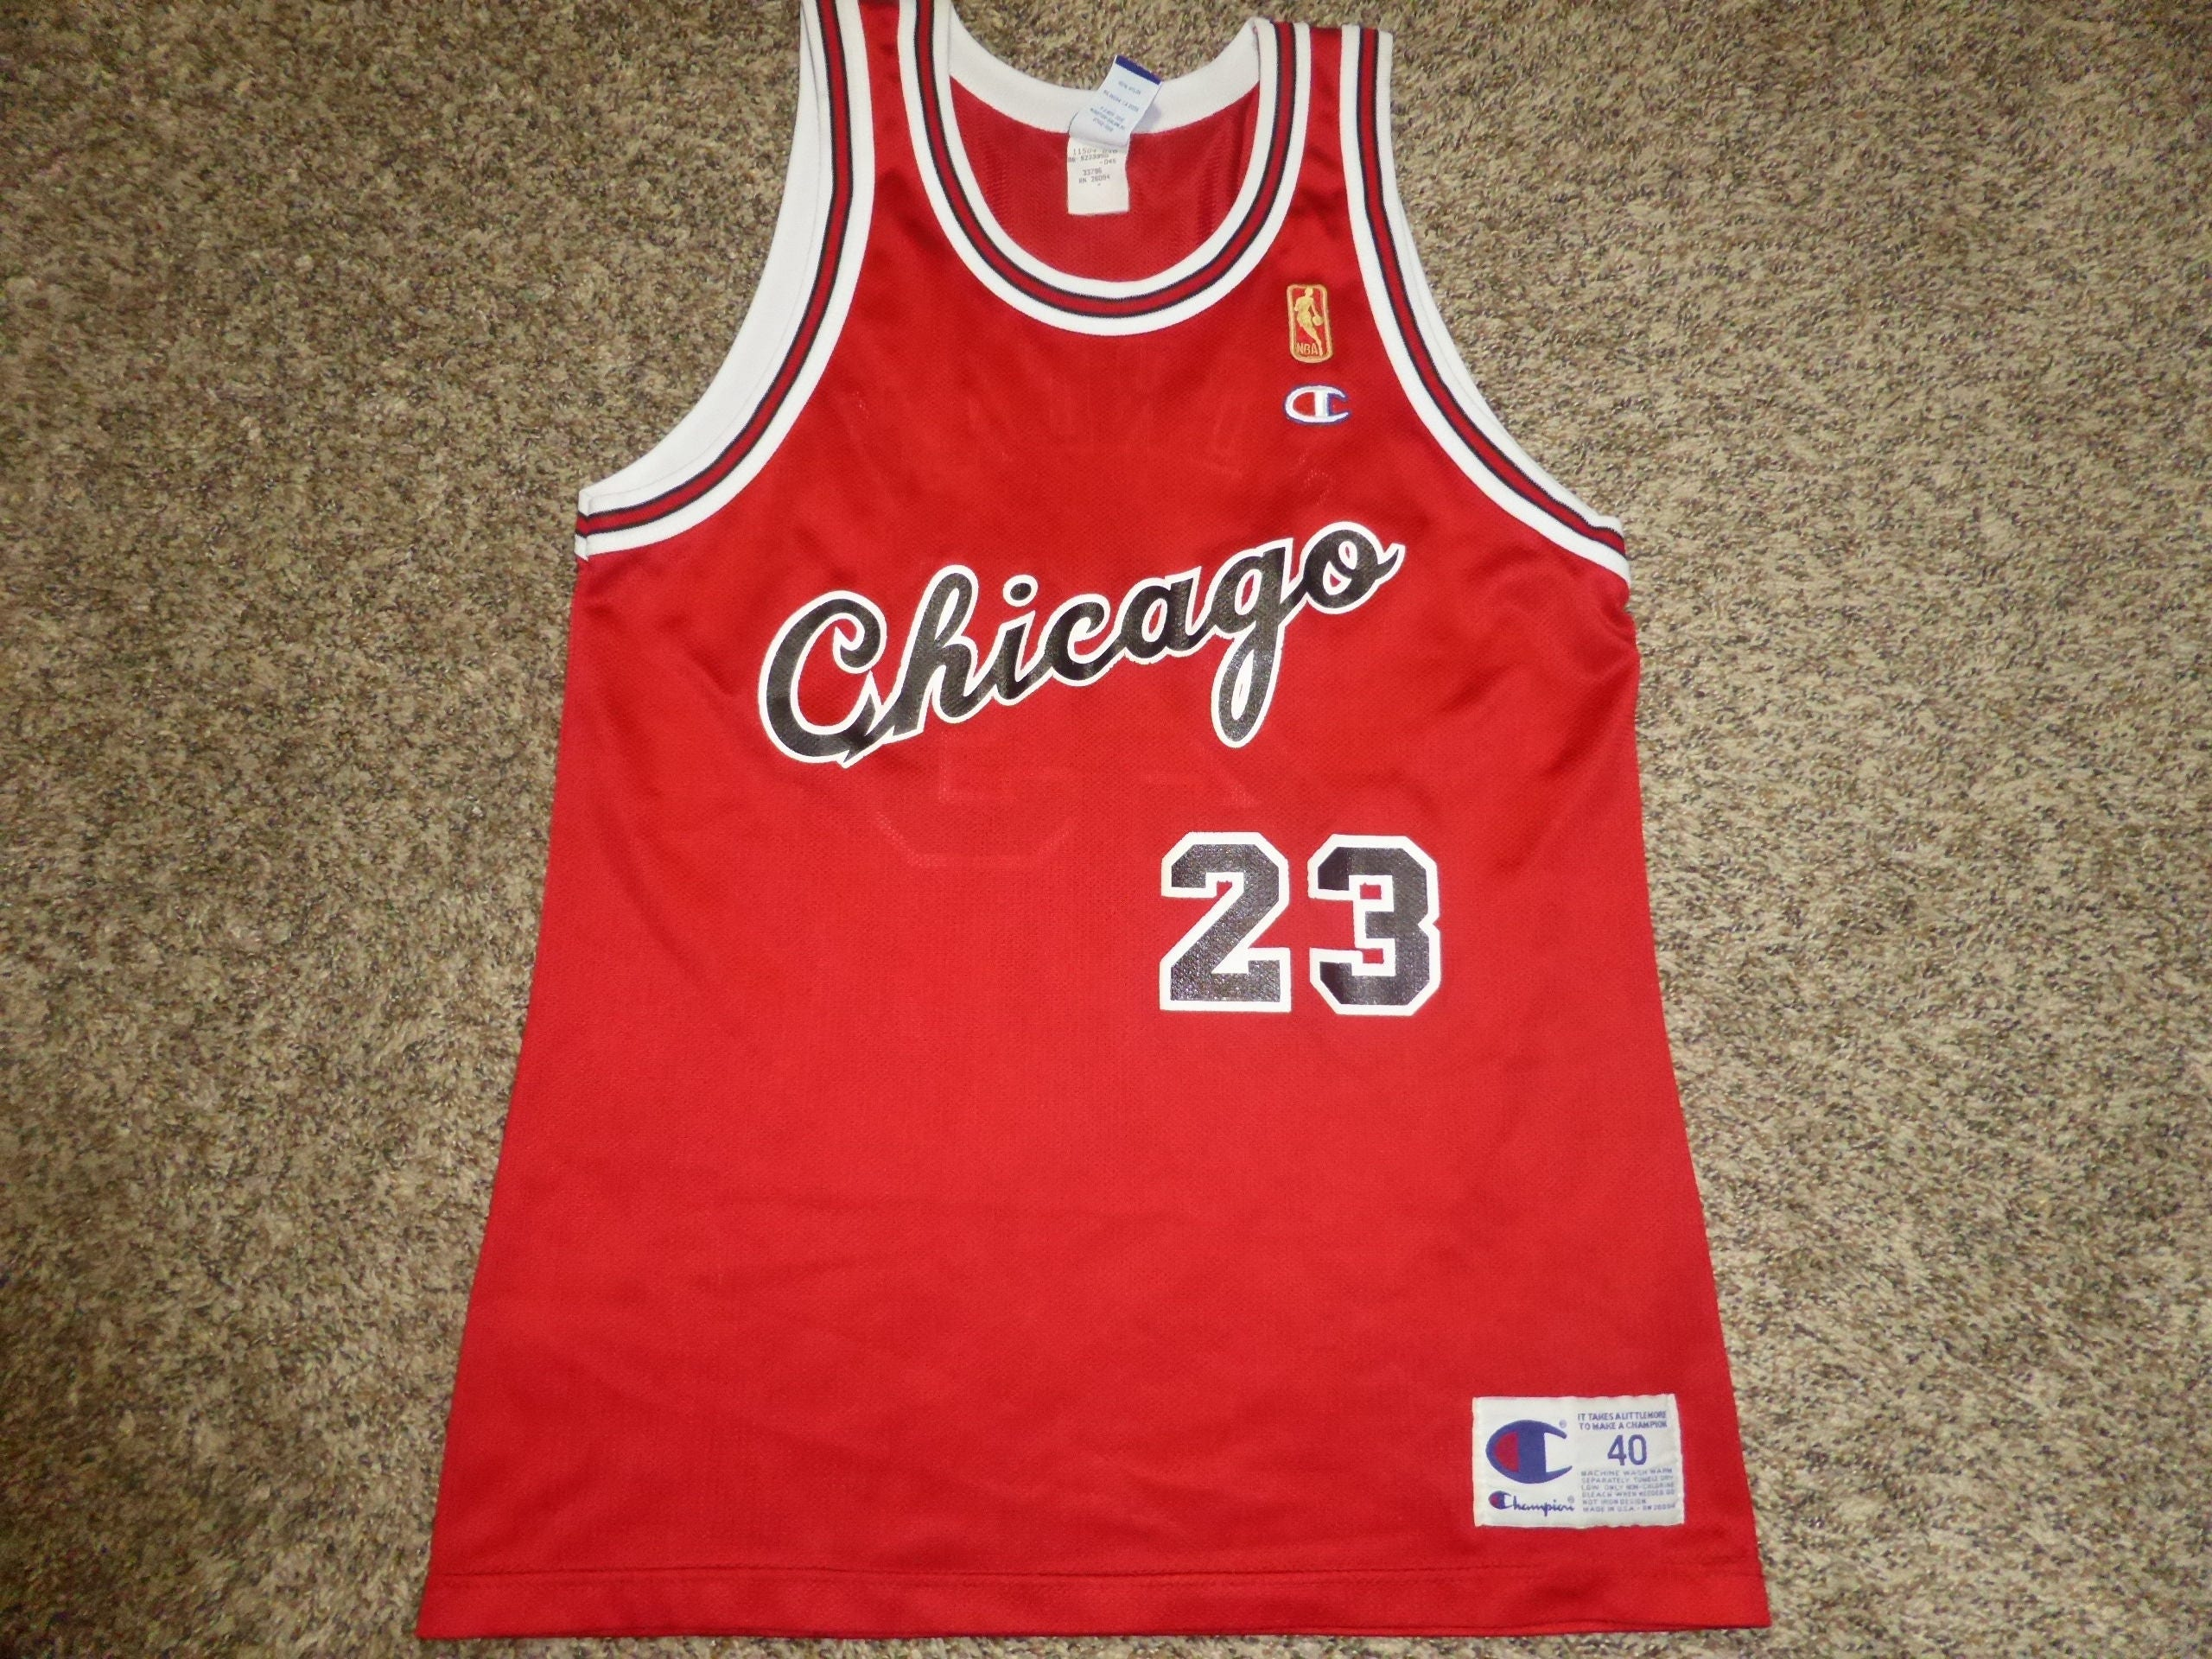 8dc8e1b9b53 ... usa vtg michael jordan chicago bulls nba gold logo champion jersey  75235 5ea8d